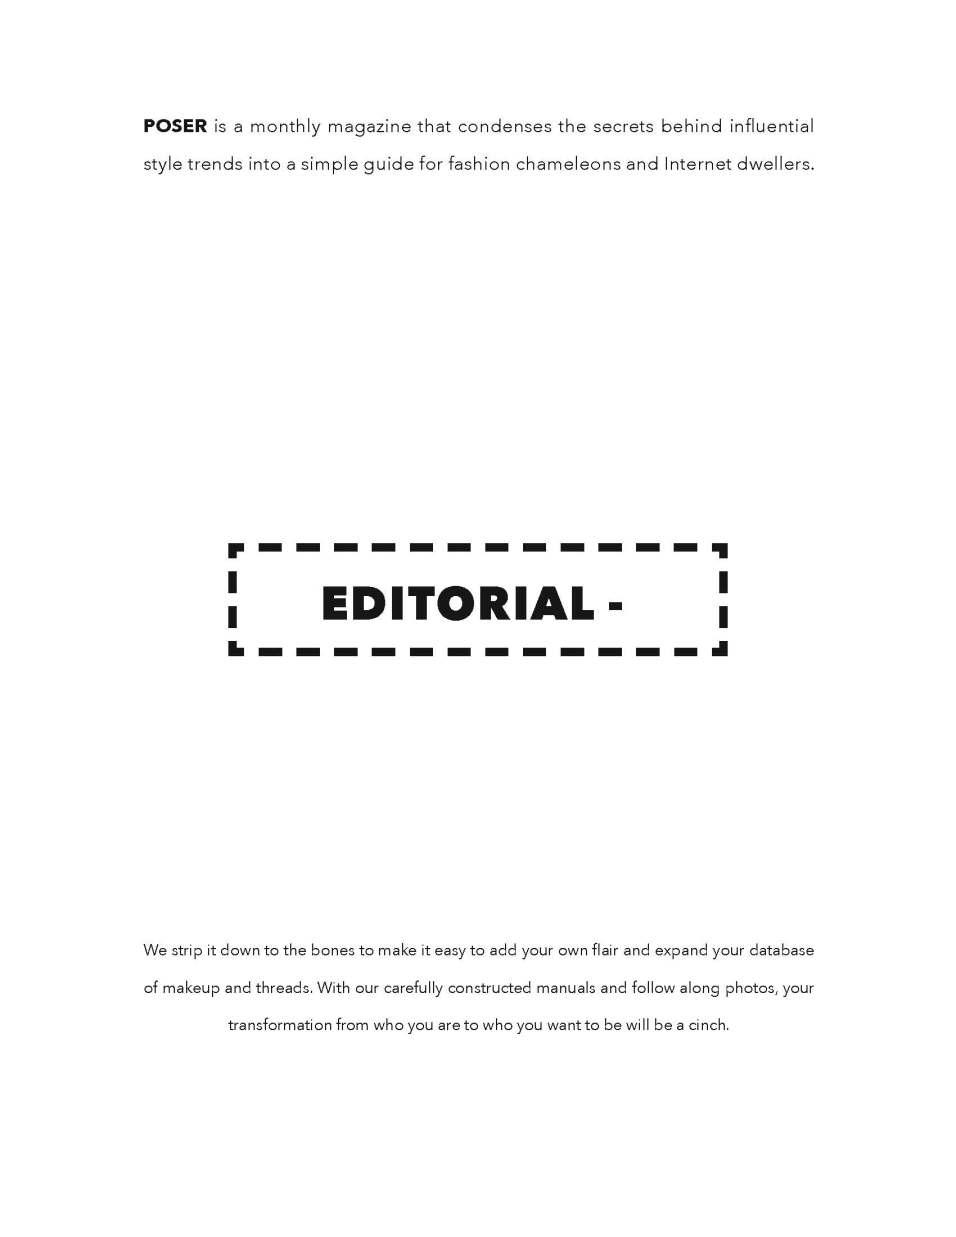 finalmagazine-1